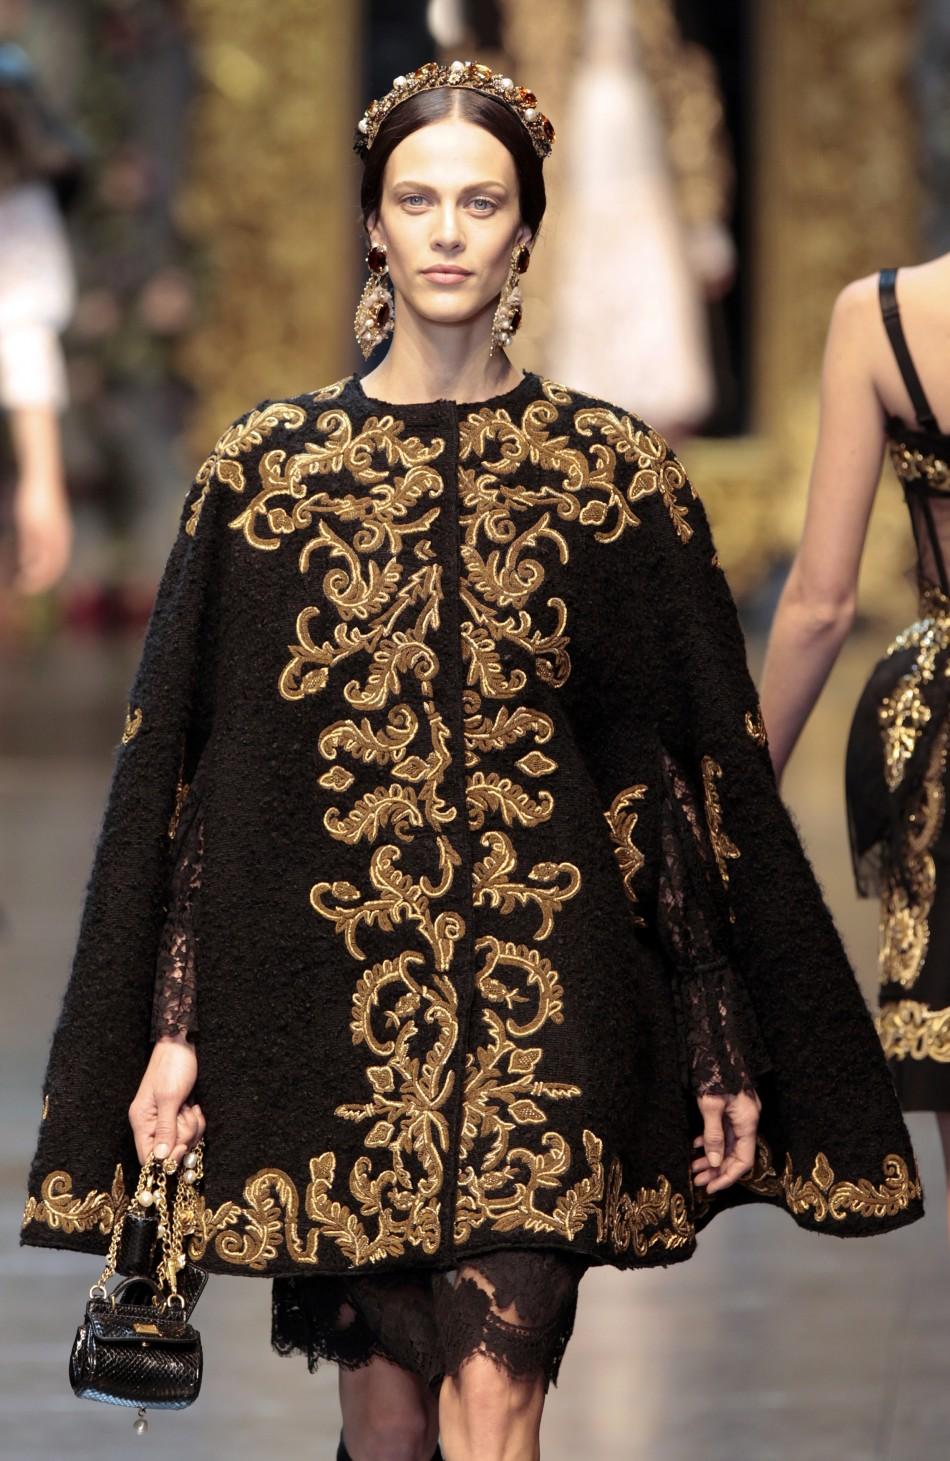 2012 milan fashion week dolce gabbana s baroque romanticism slideshow. Black Bedroom Furniture Sets. Home Design Ideas